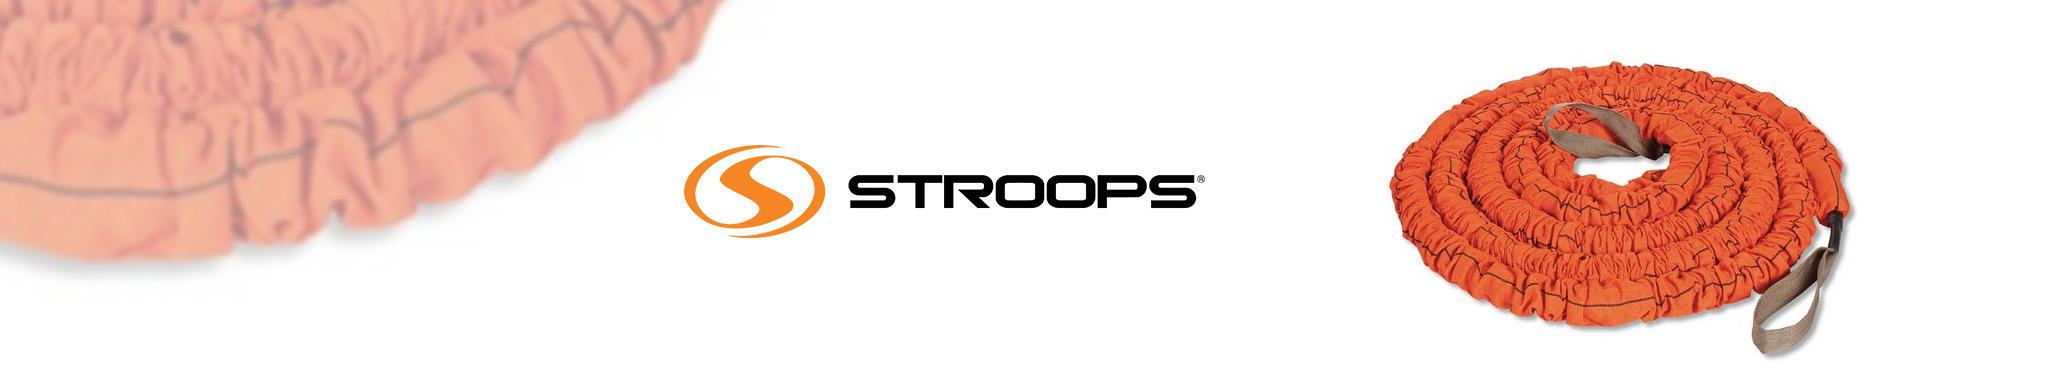 Stroops : équipements & accessoires de la marque Stroops | Dragon Bleu